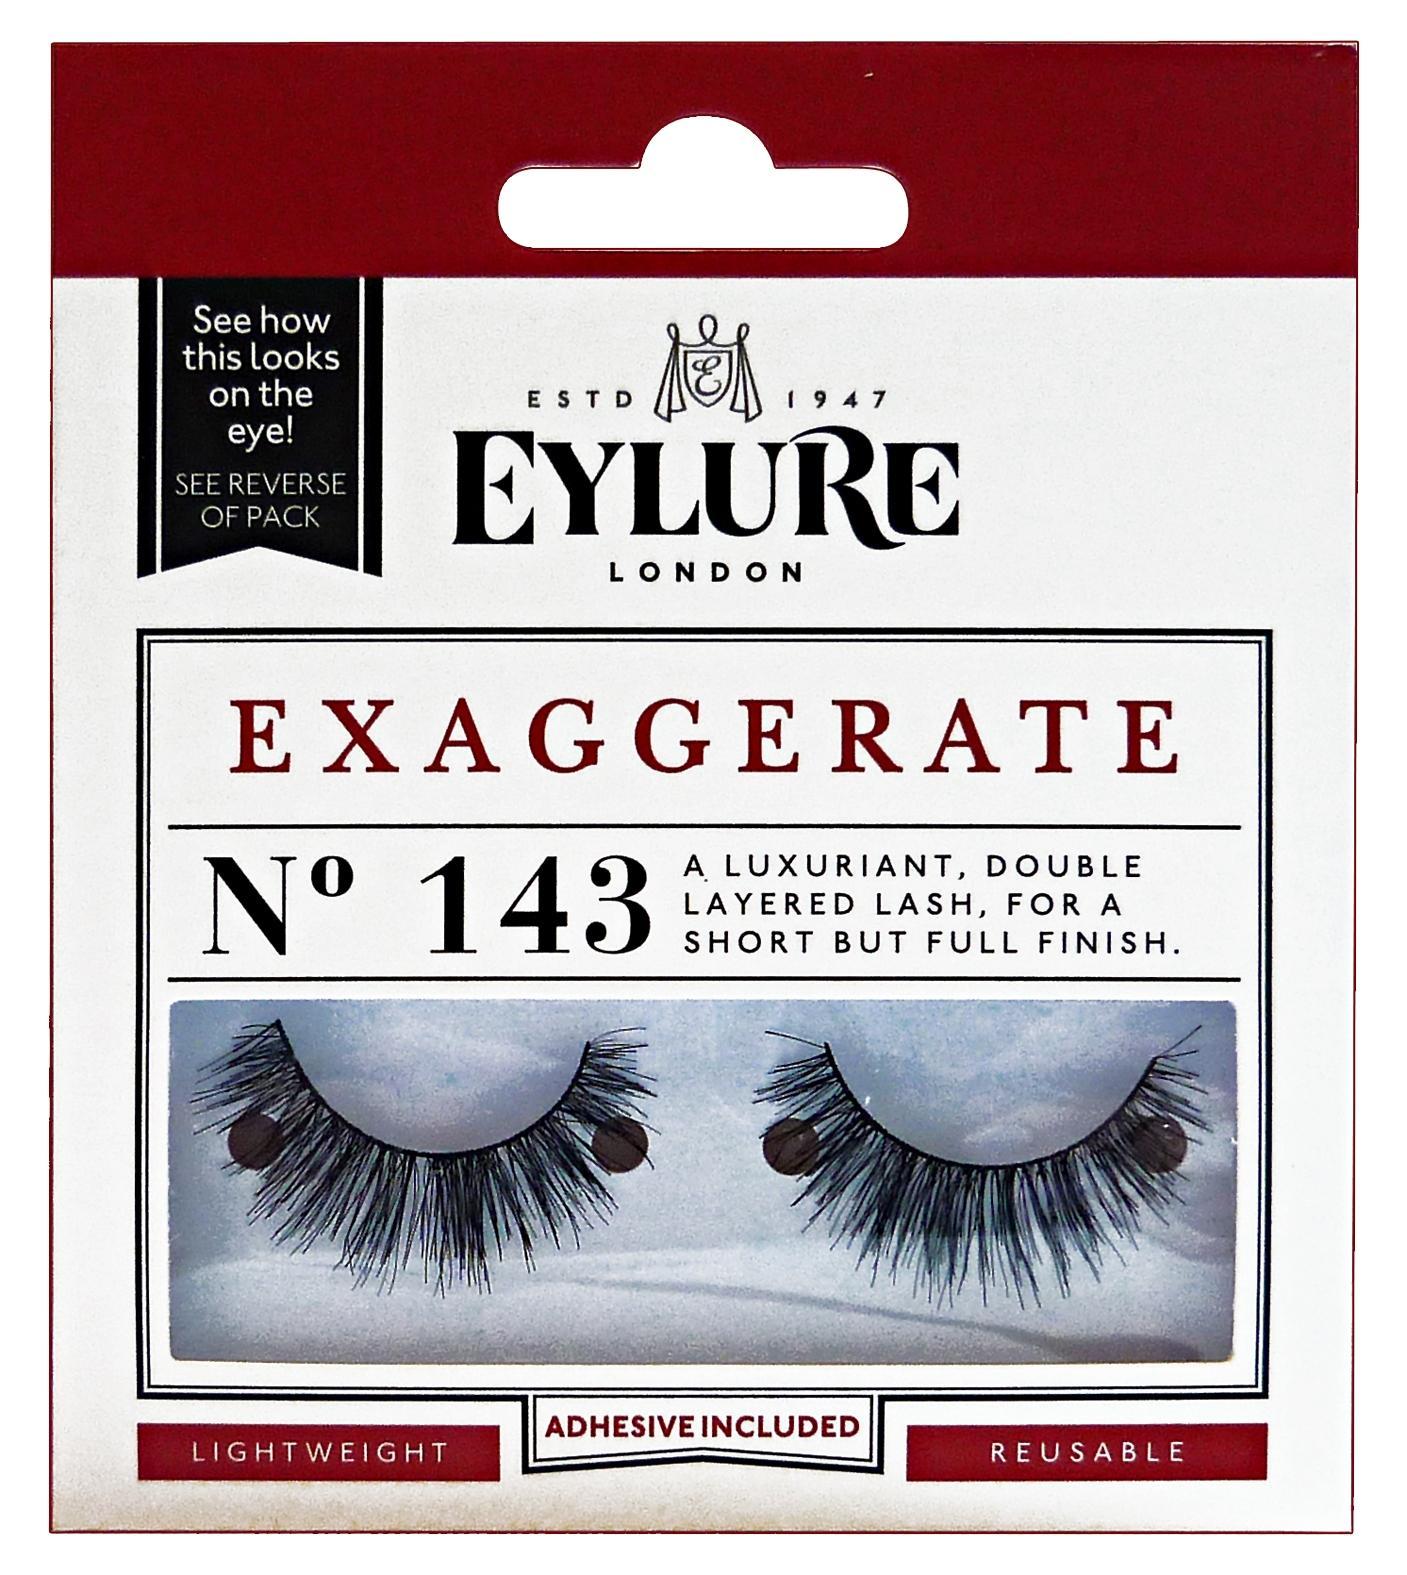 7e3efc81705 EYLURE Ciglia finte 143 exaggerate - trucco/make up - Glooke